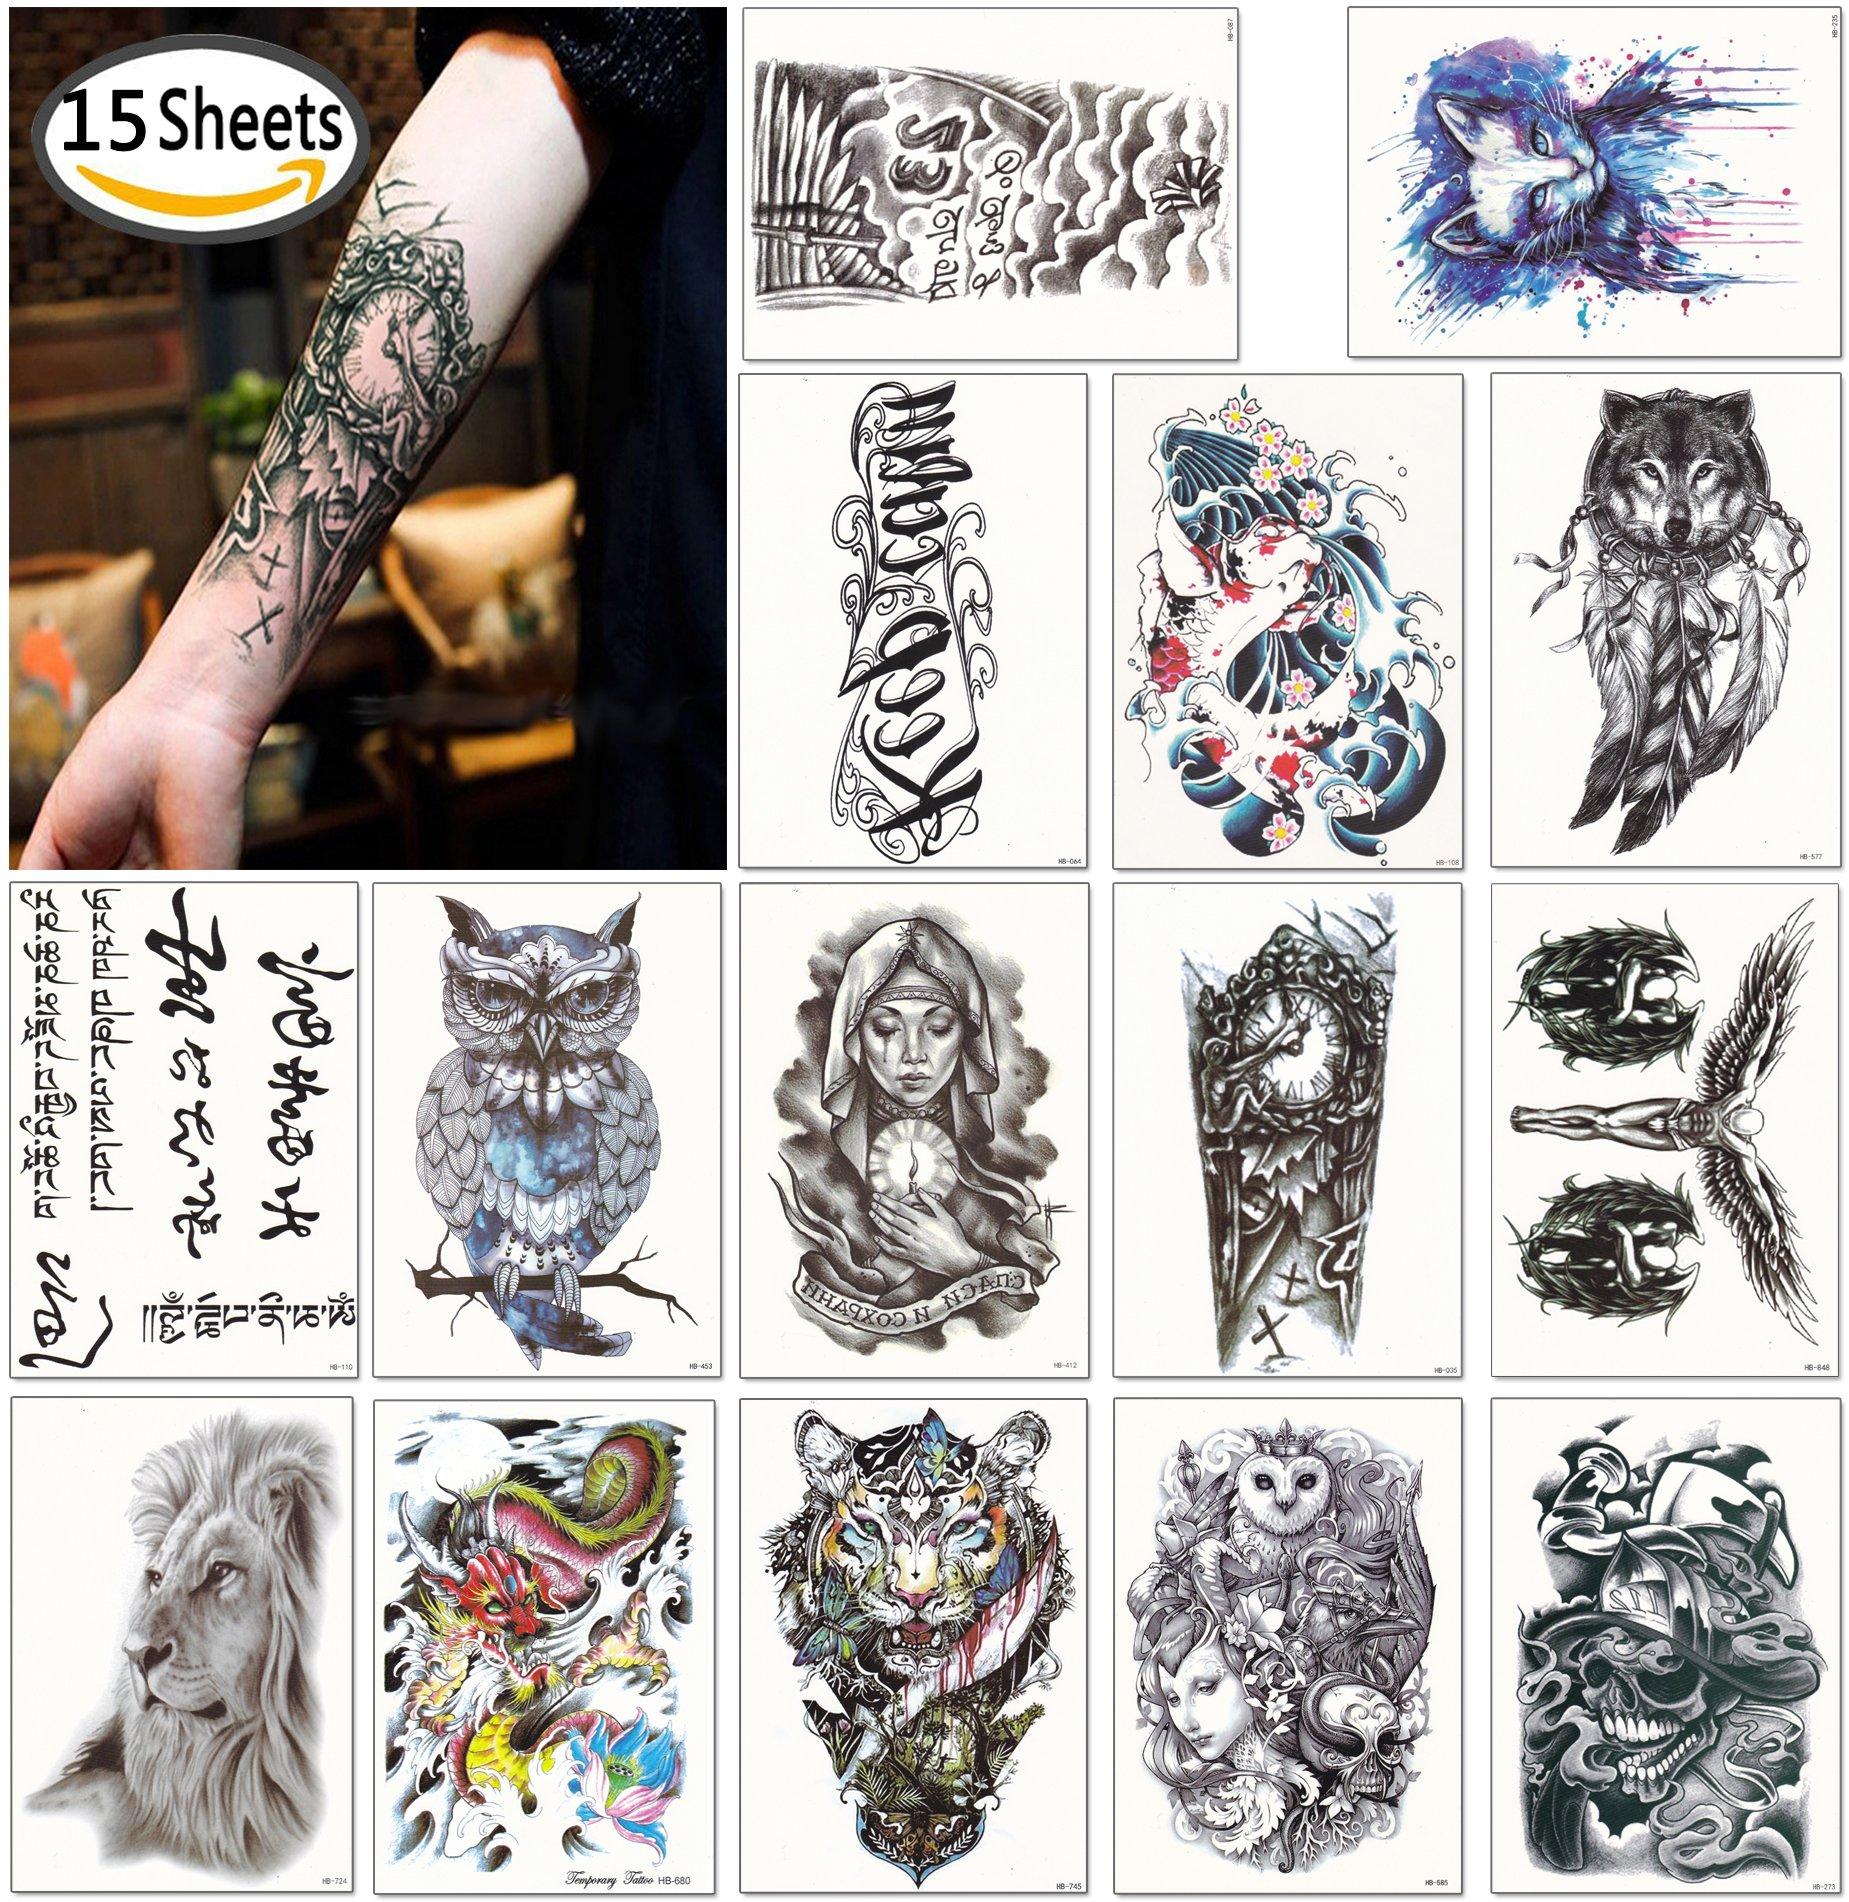 DaLin Large Temporary Tattoos Half Arm Tattoo Sleeves 15 Sheets, Robot Arm, Dead Skull, Koi Fish, Lion, Owl, Dragon, Tiger and more